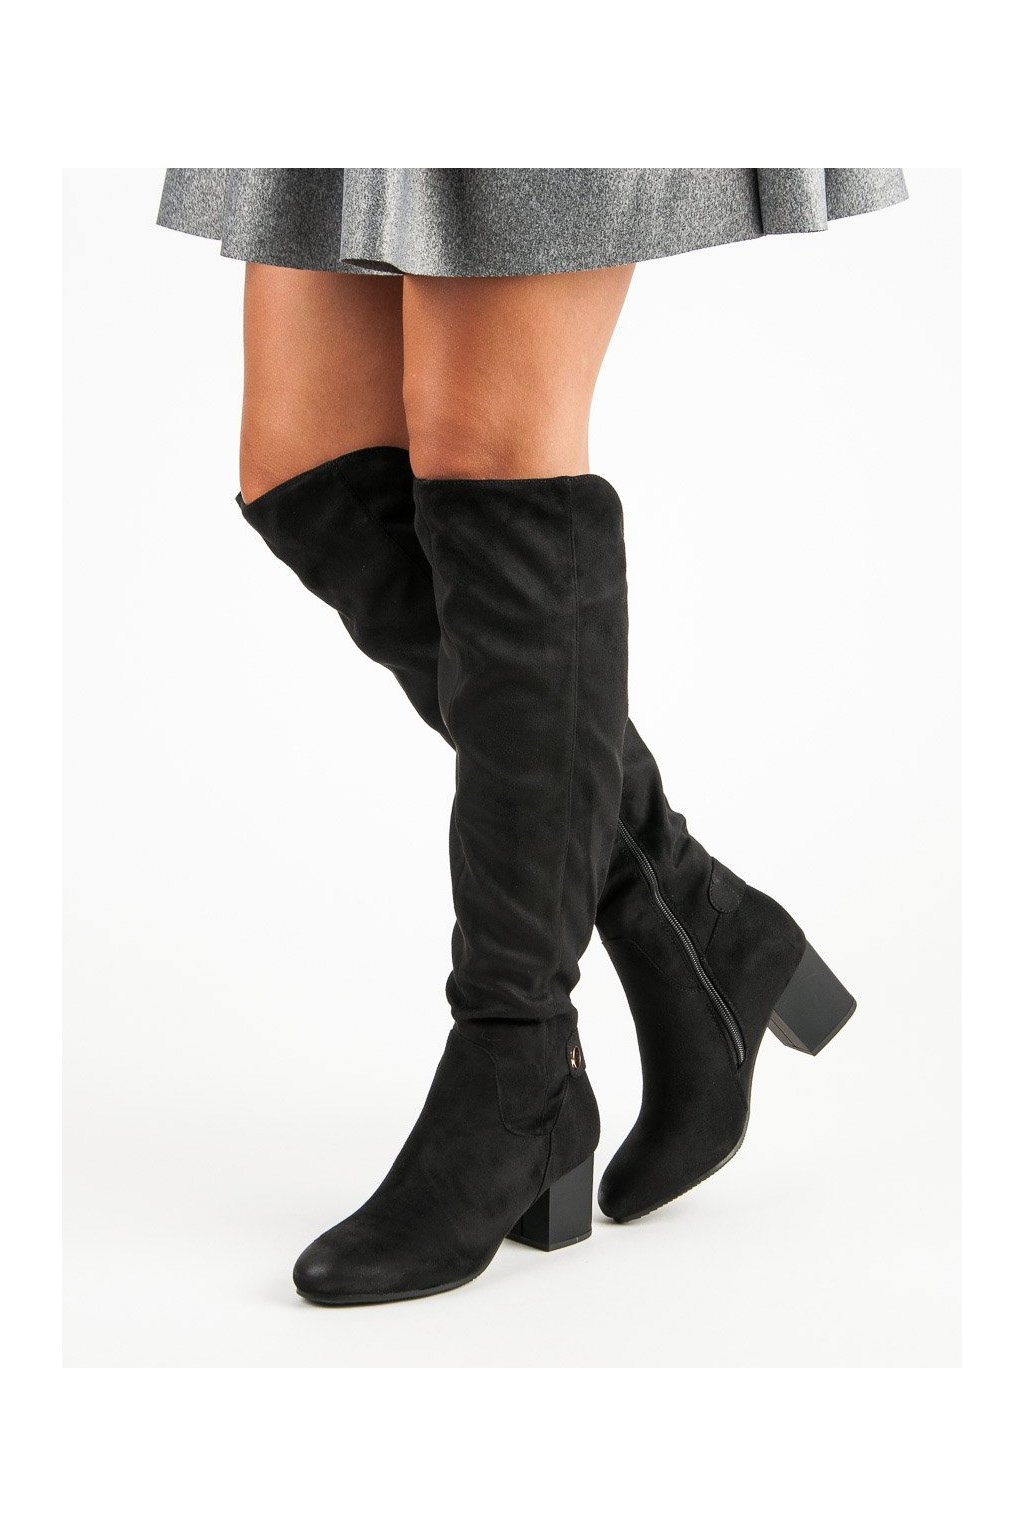 Vysoké čierne čižmy nad koleno s hrubým opätkom VINCEZA  f2fb374d325